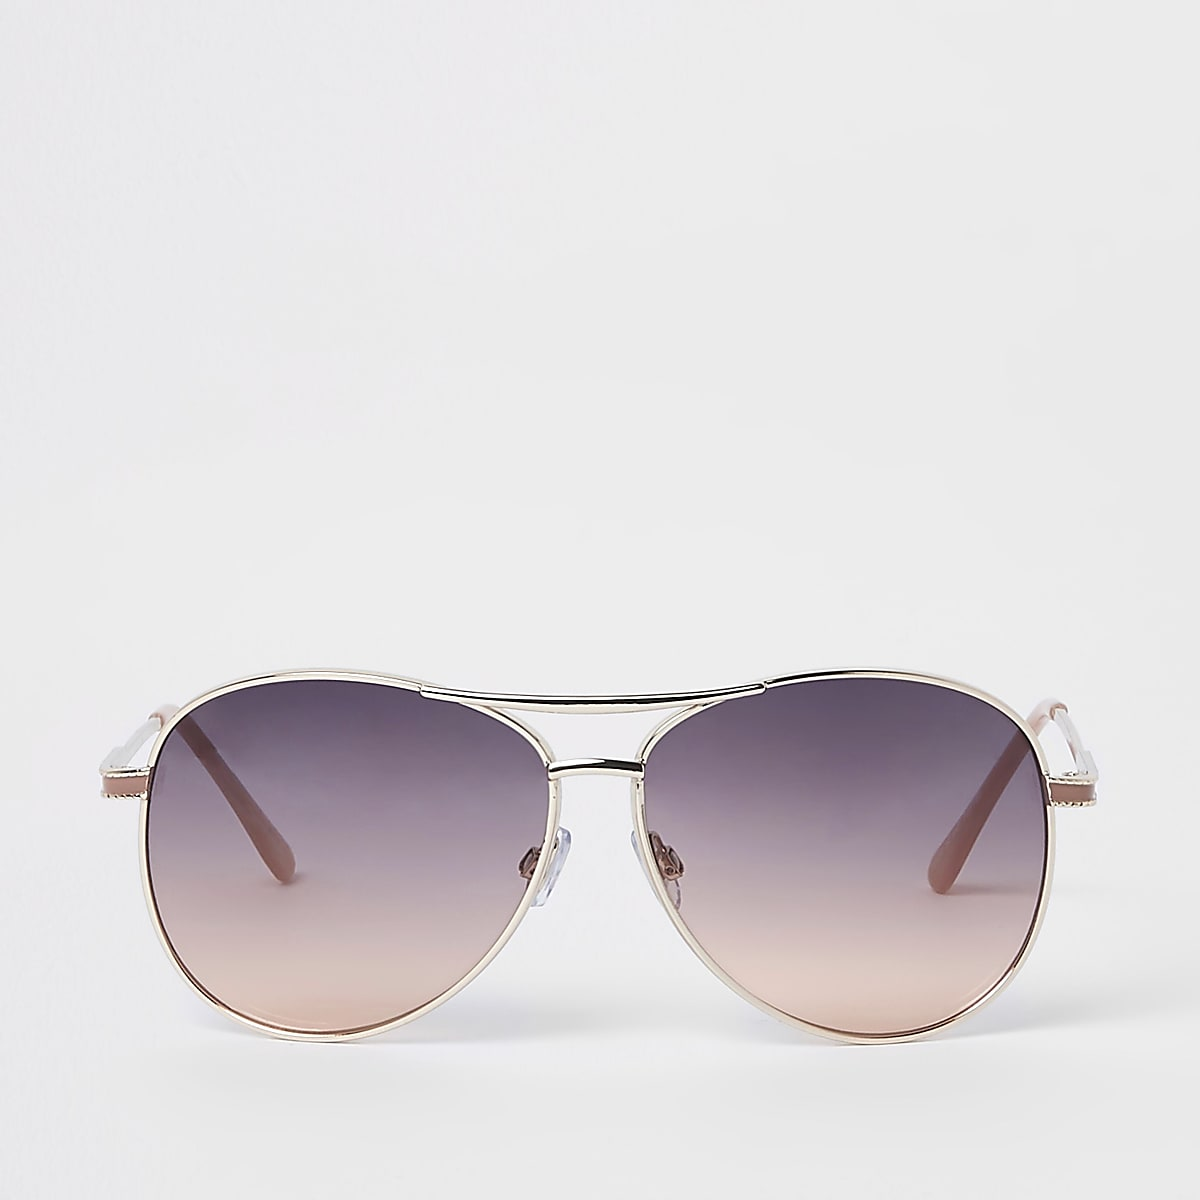 Goudkleurige pilotenzonnebril met getinte glazen